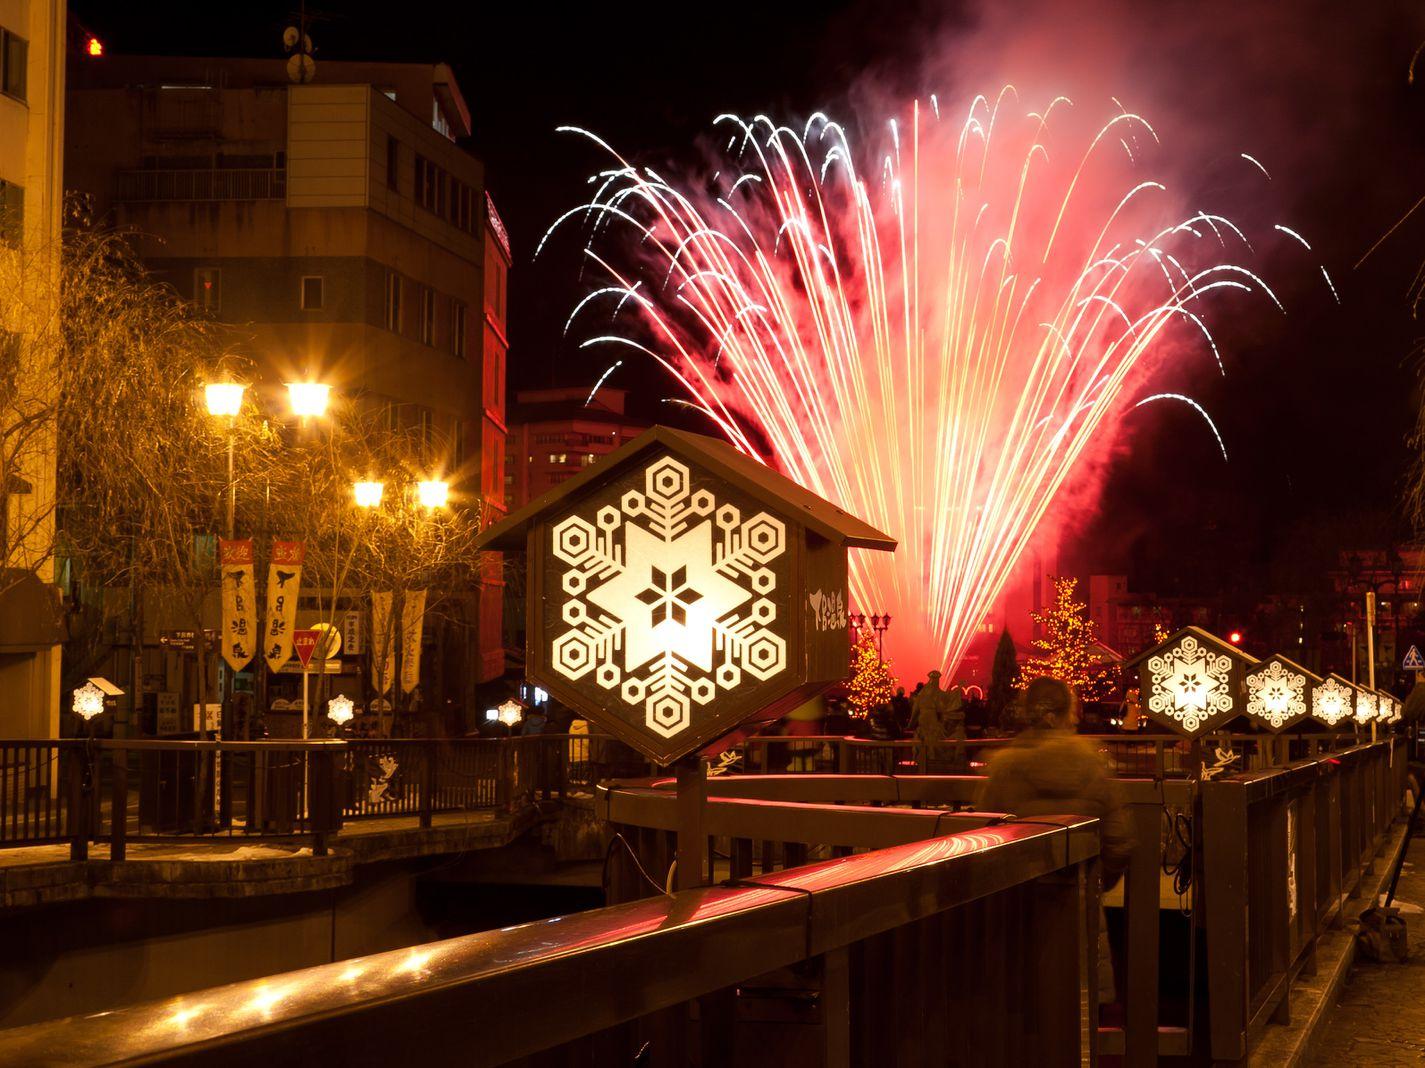 Gero fireworks story(winter)